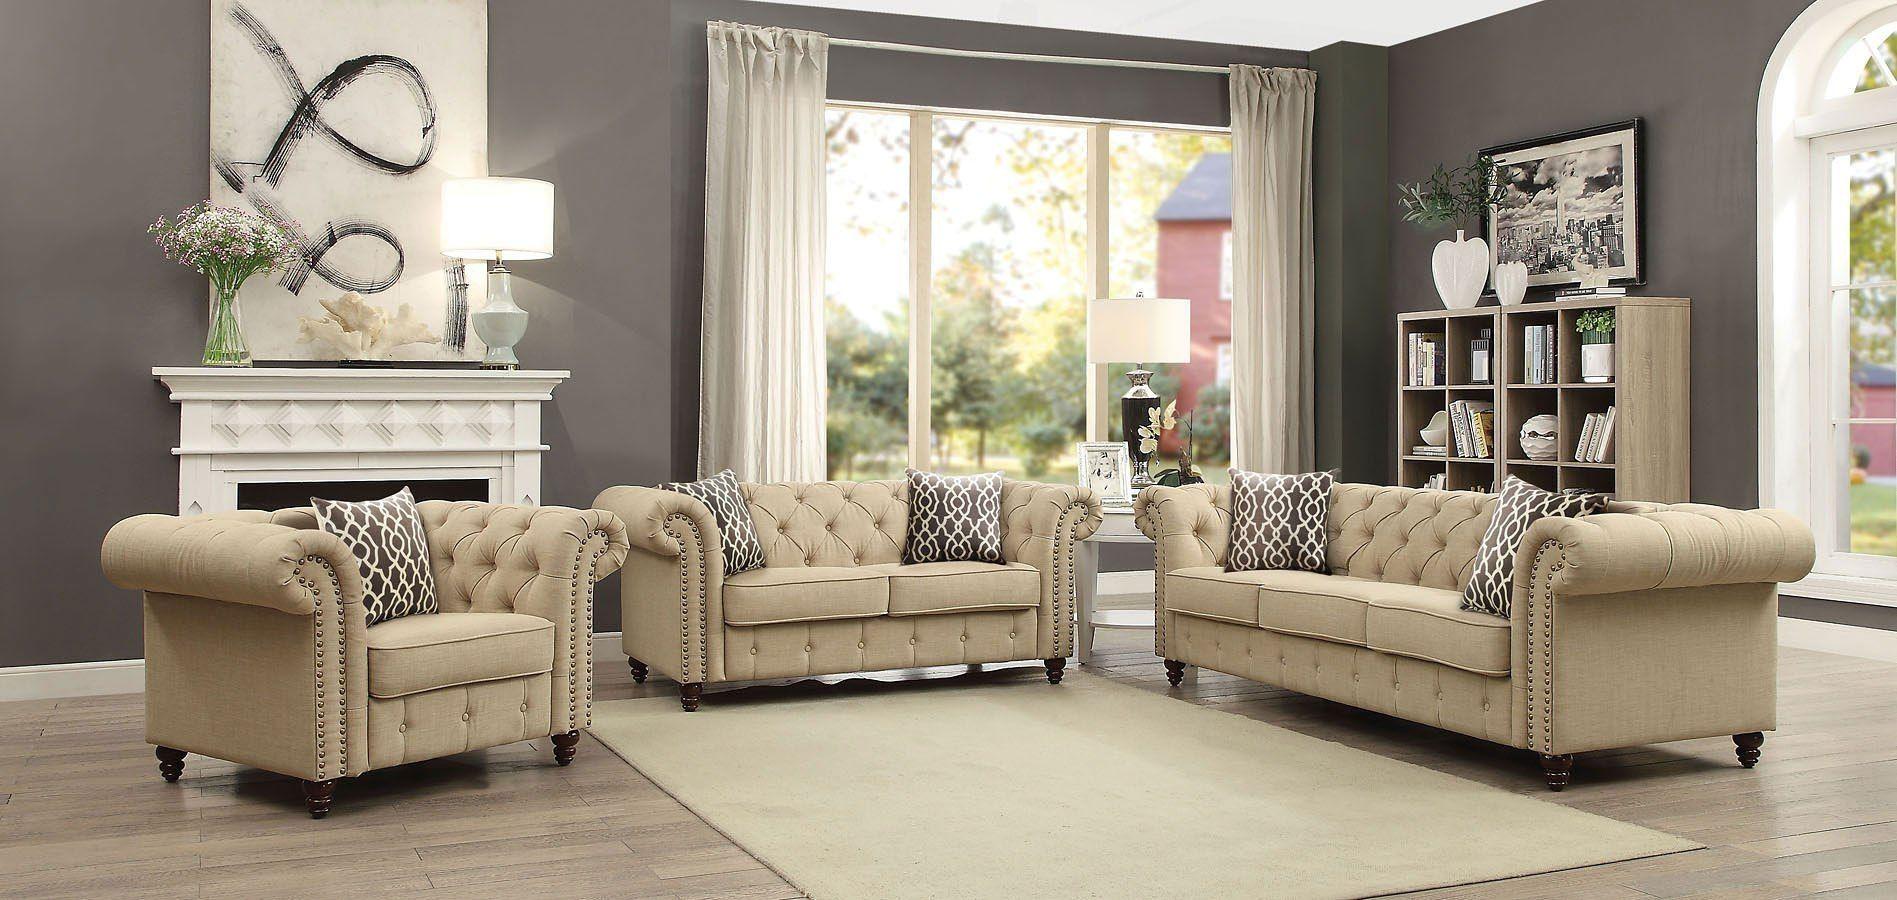 Aurelia living room set beige у р Список покупок